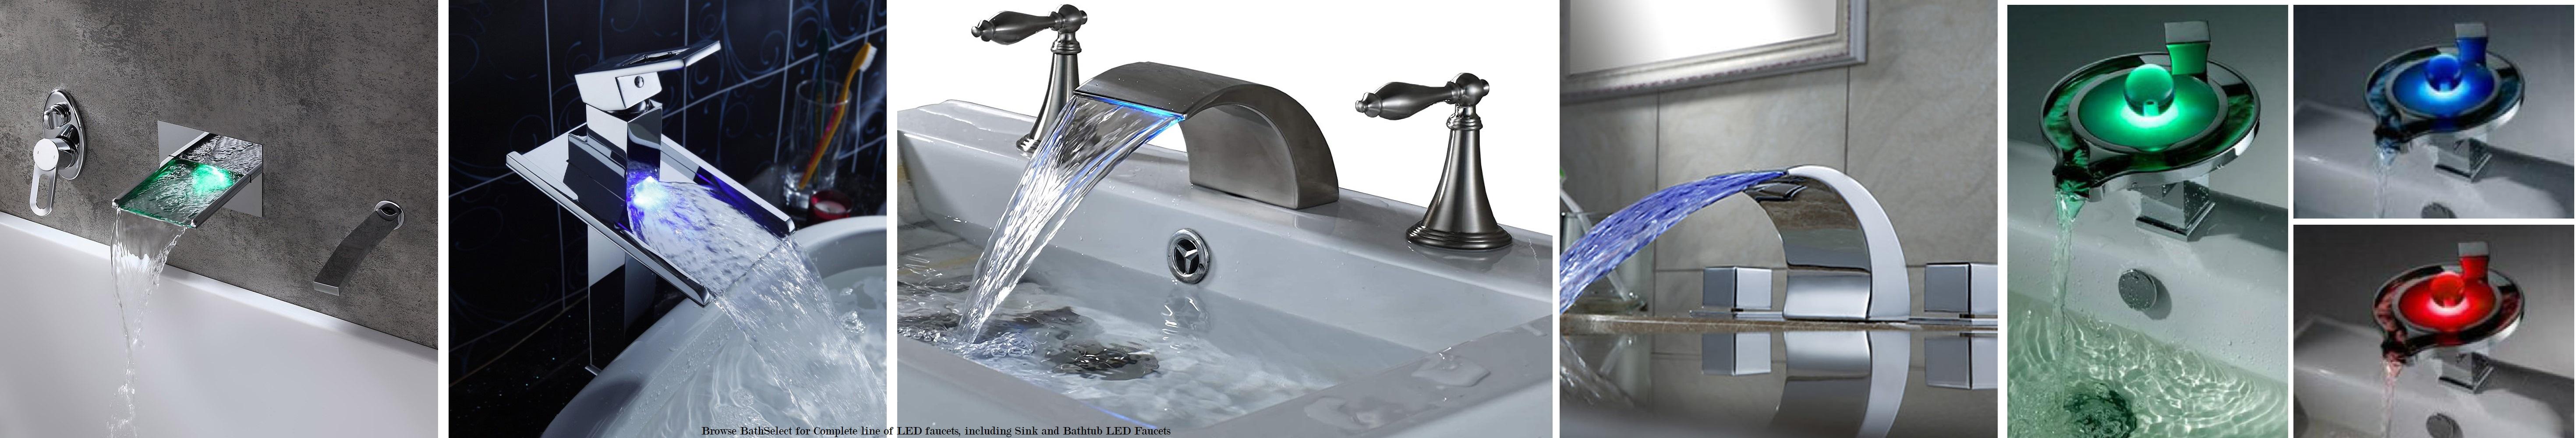 on sale led bathroom faucets